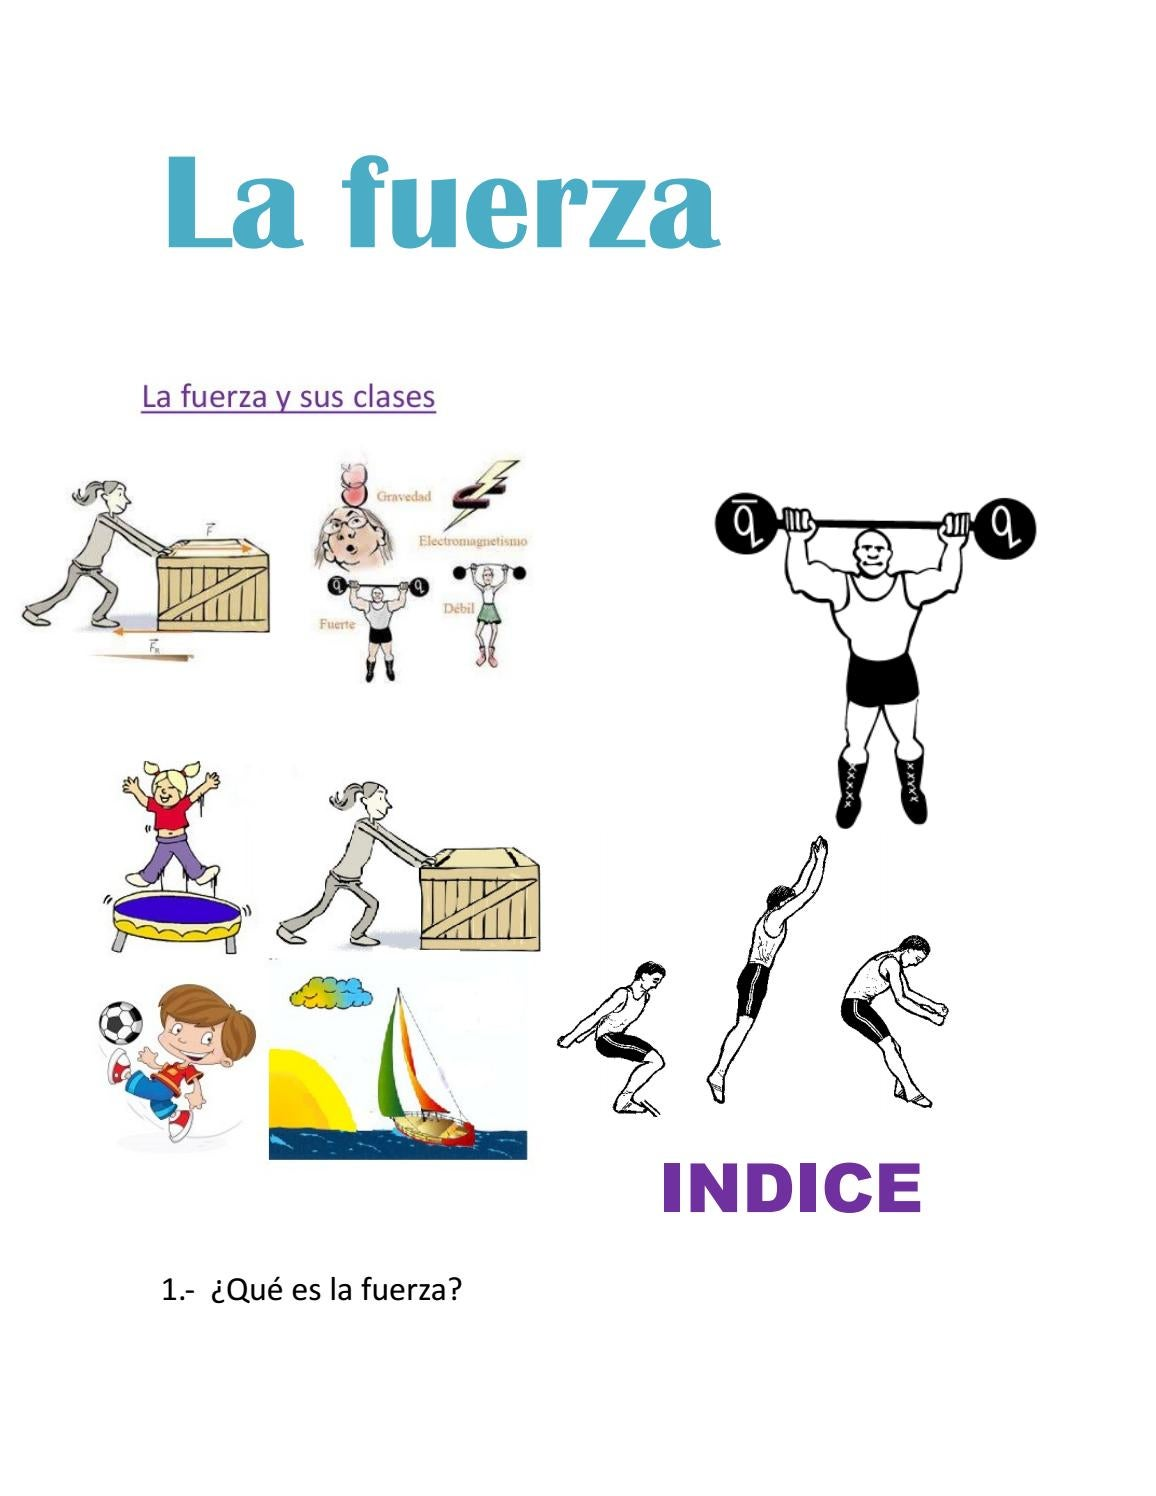 La fuerza by diana - Issuu